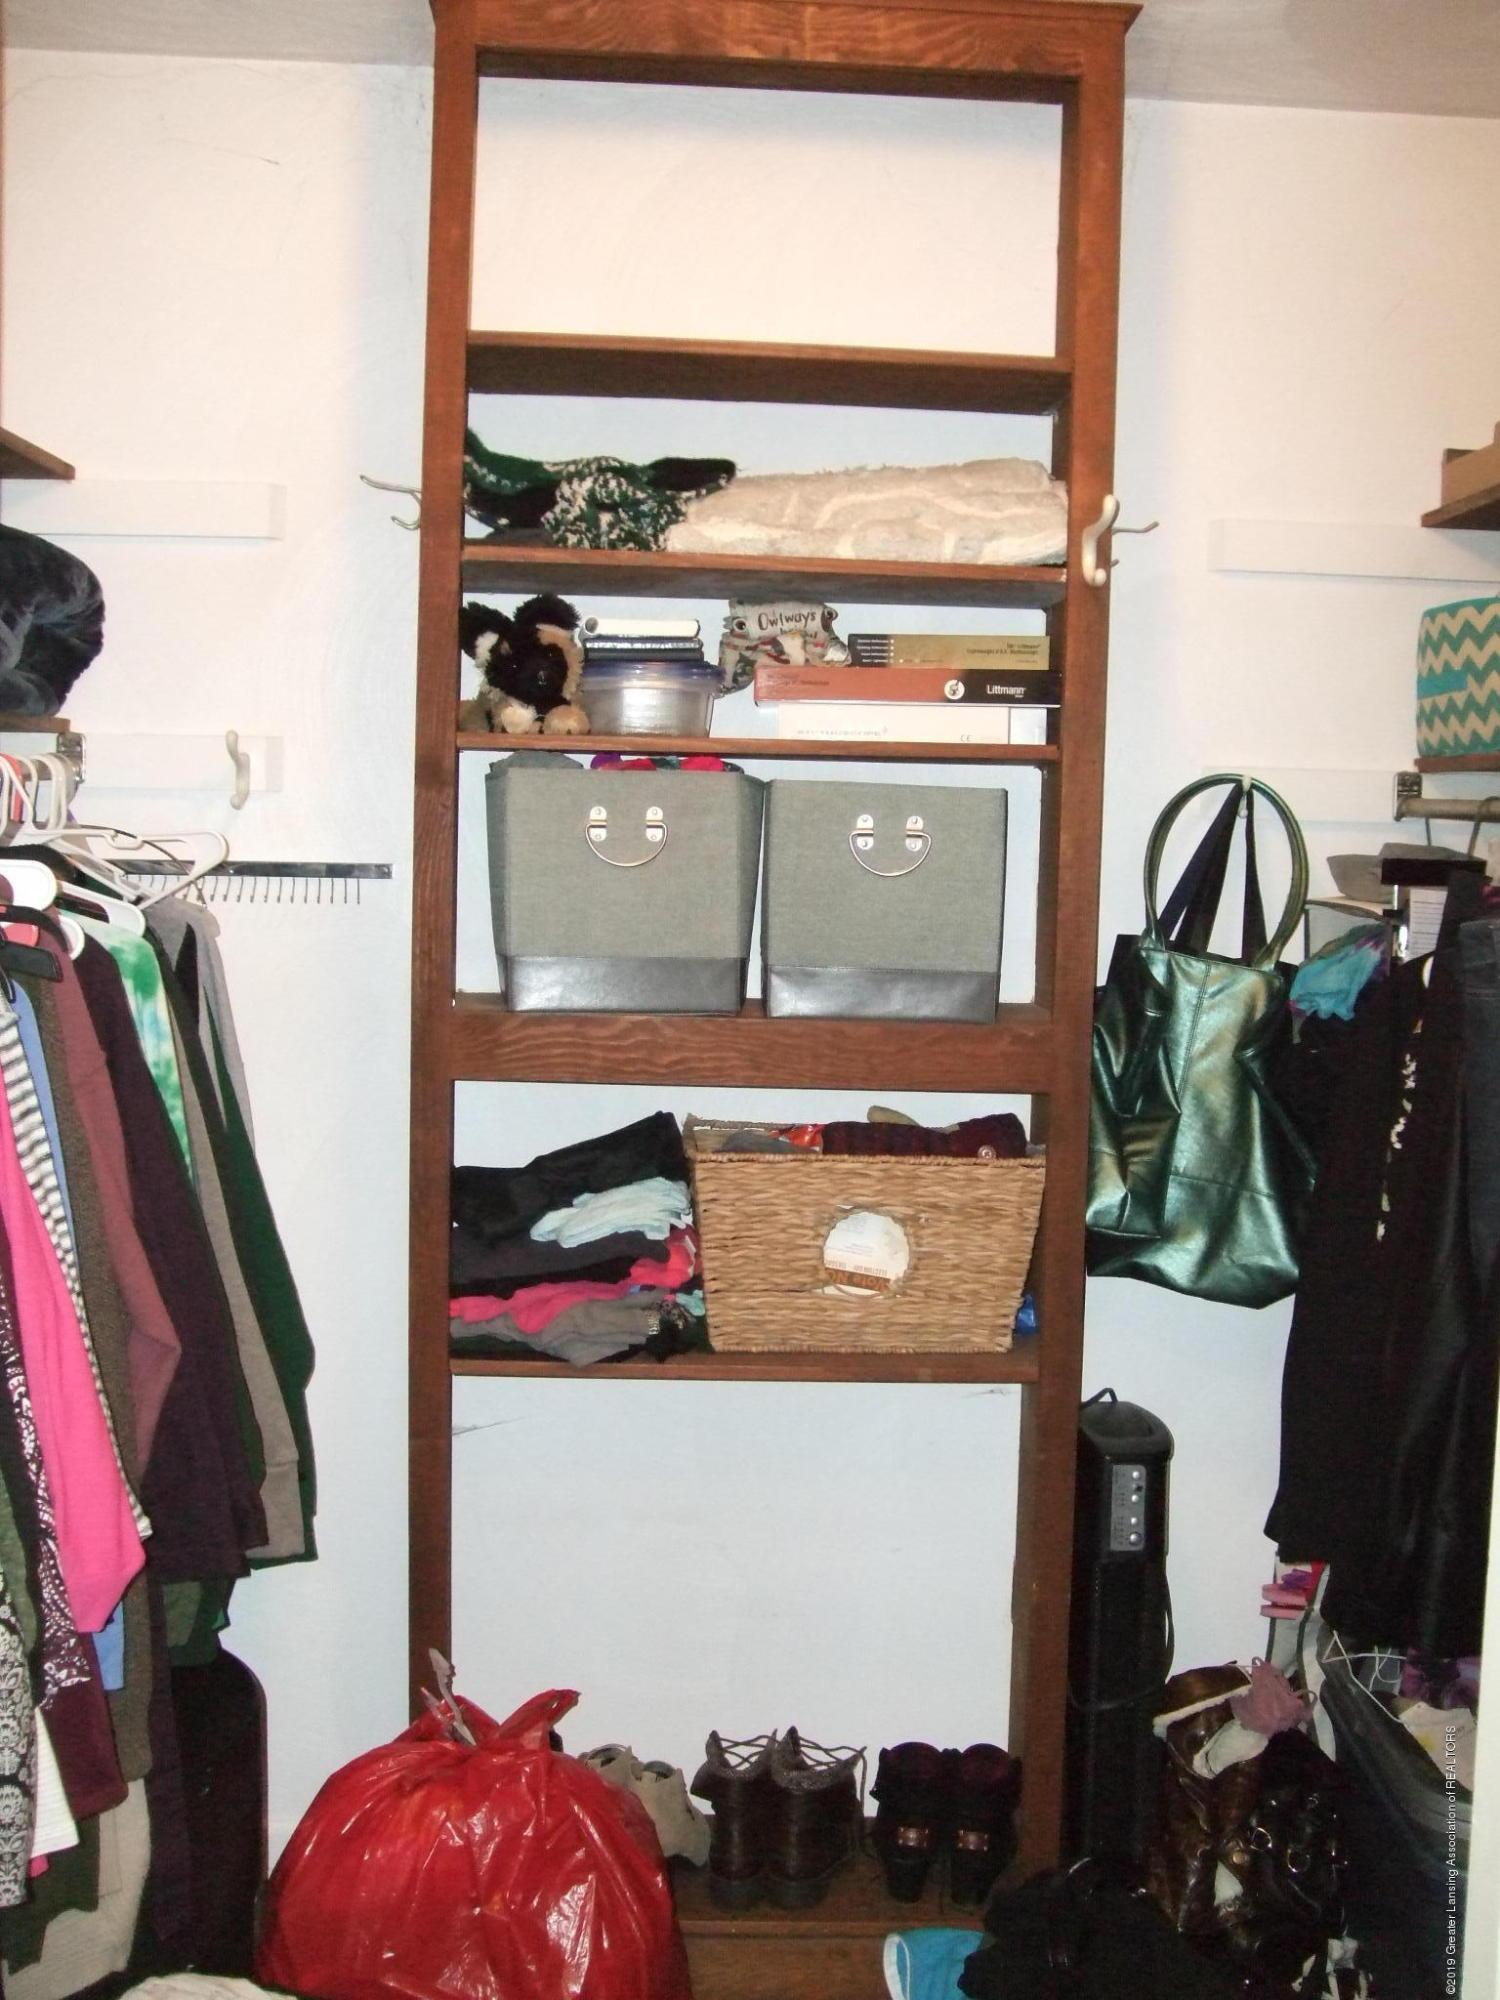 6160 Innkeepers Ct APT 56 - Walk-in Closet - 10